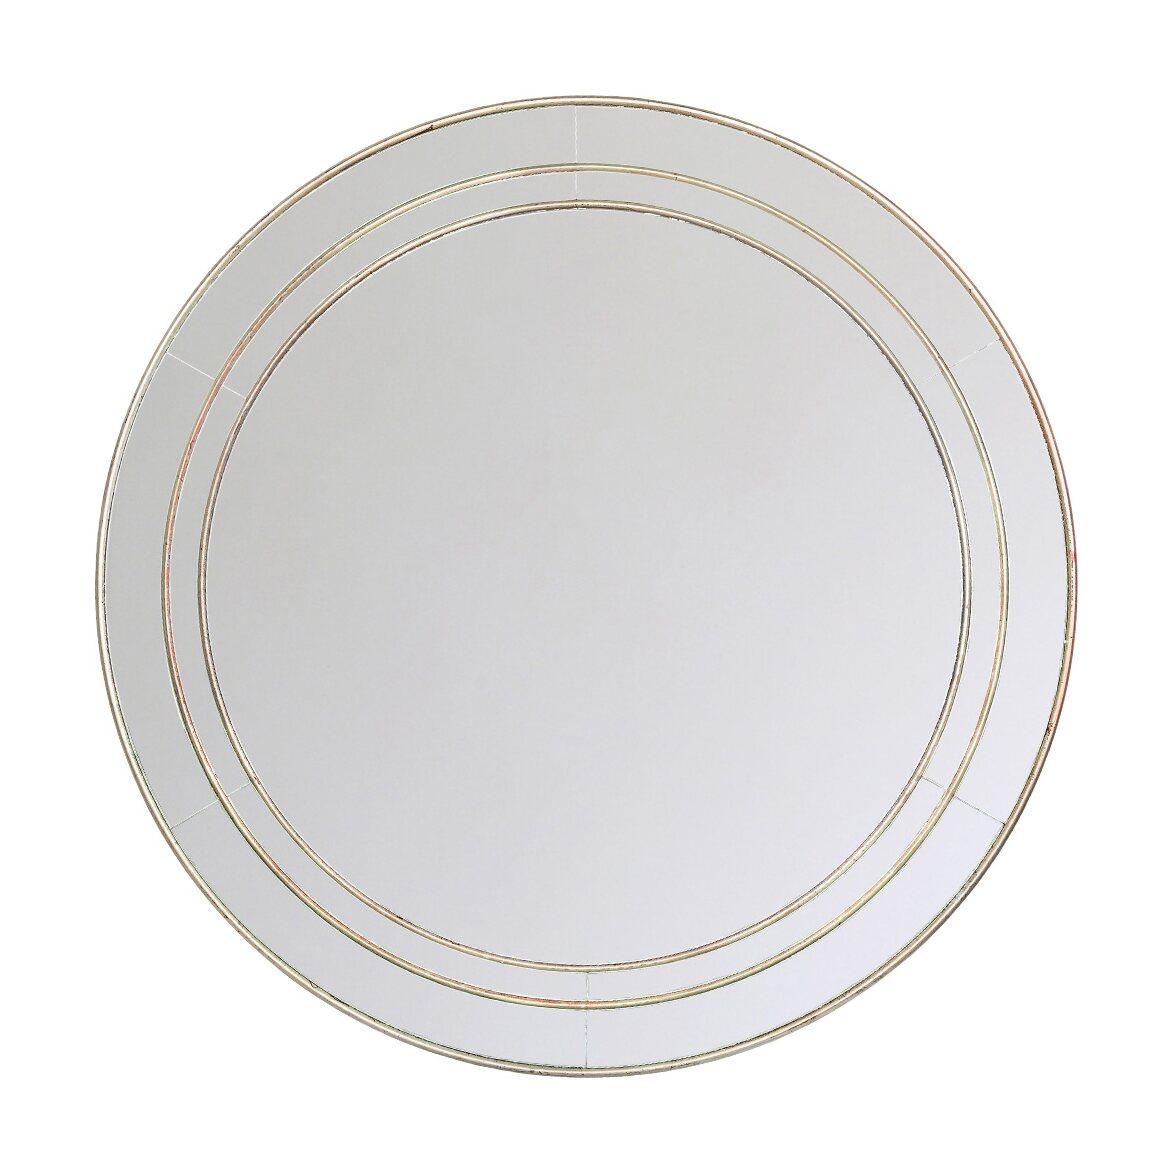 Настенное зеркало «Орион»   Настенные зеркала Kingsby